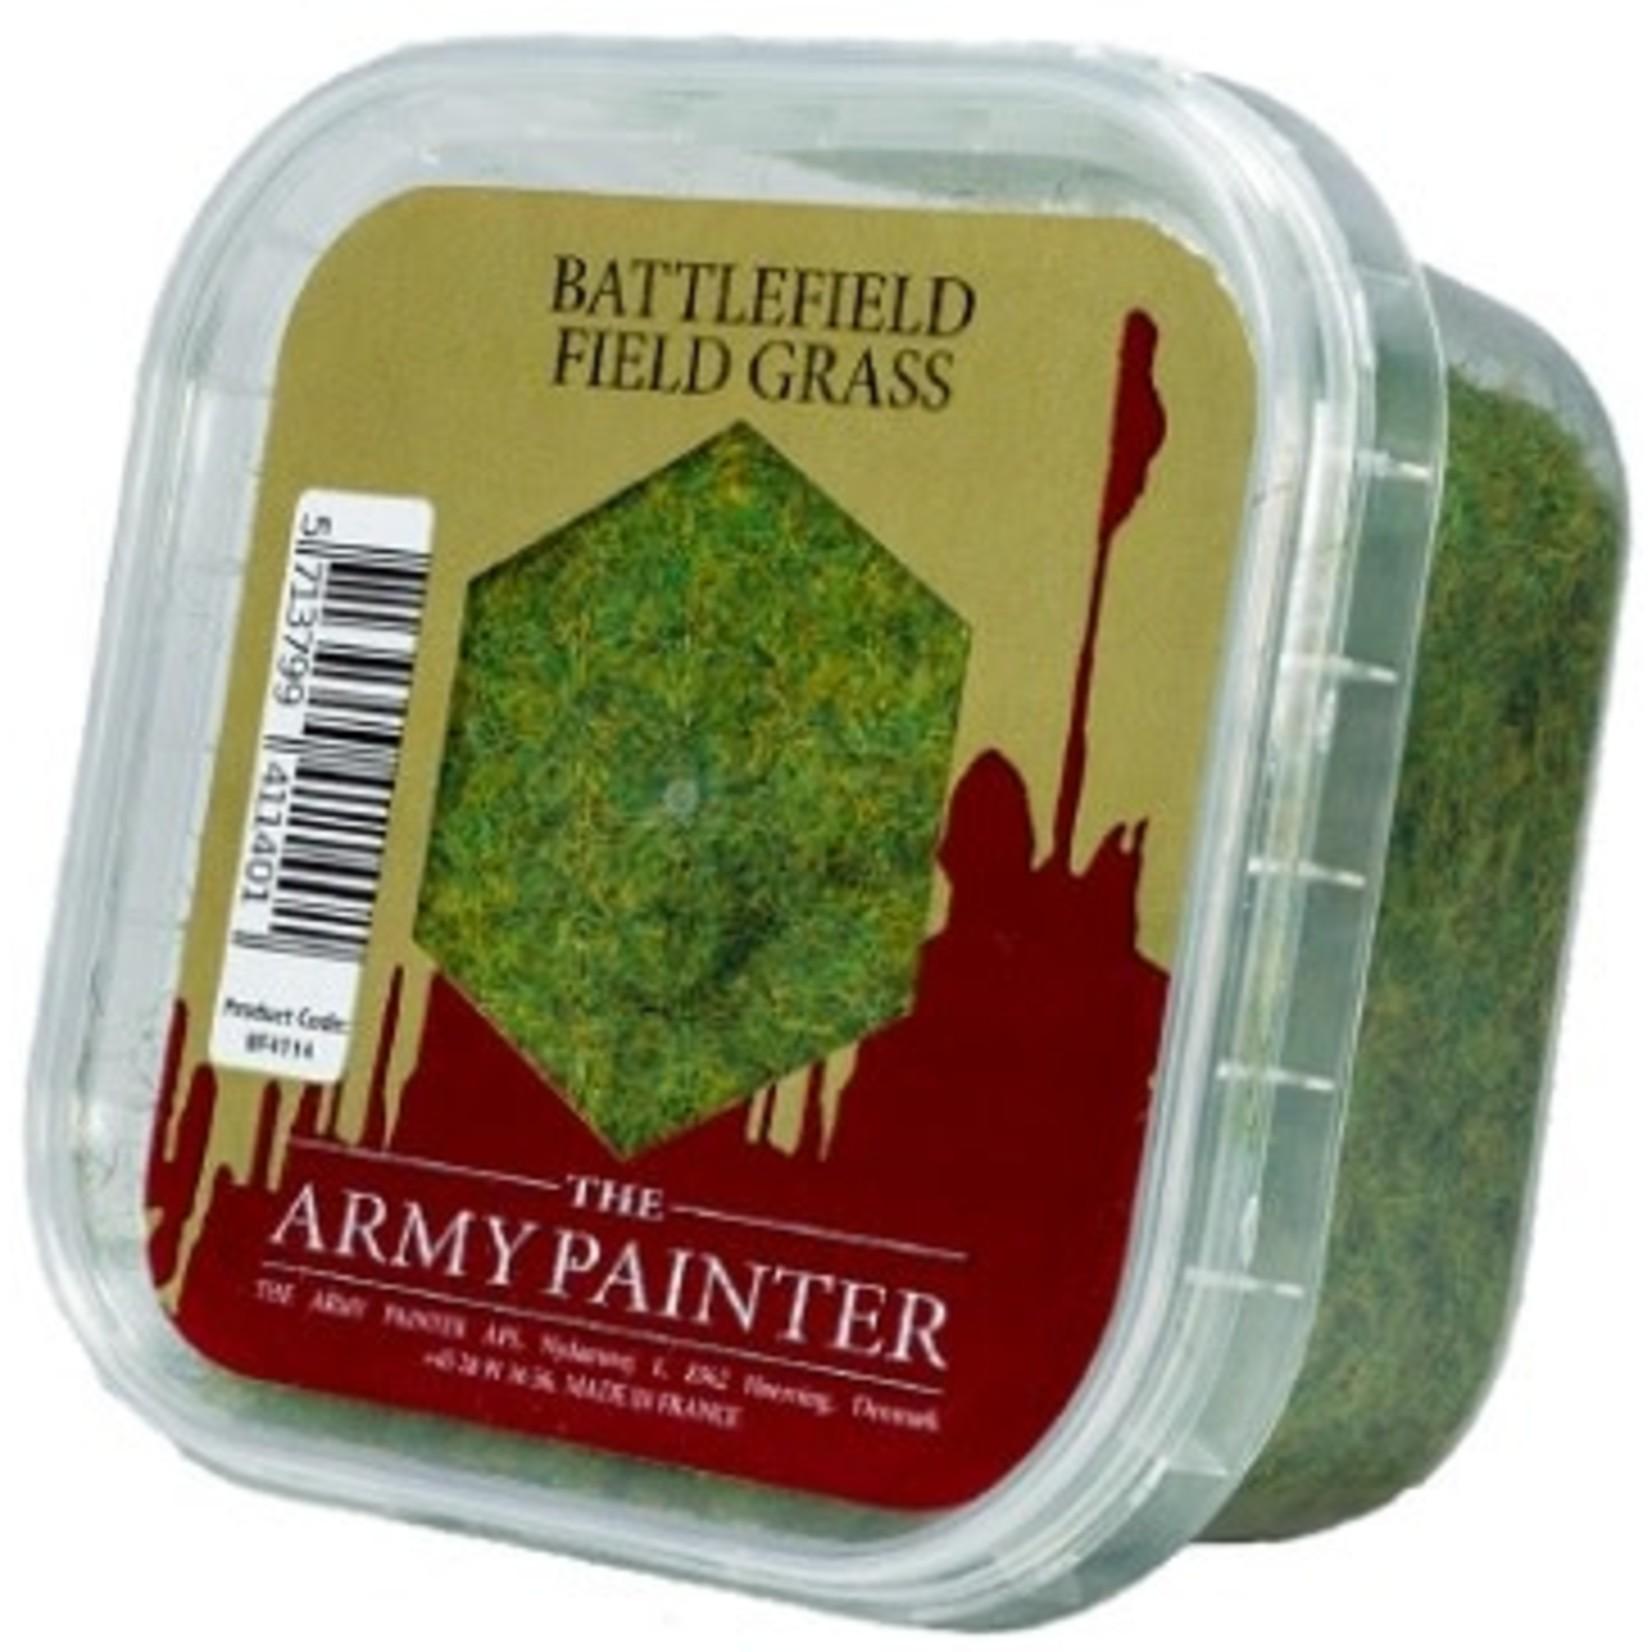 Army Painter Battlefields : Static Field Grass